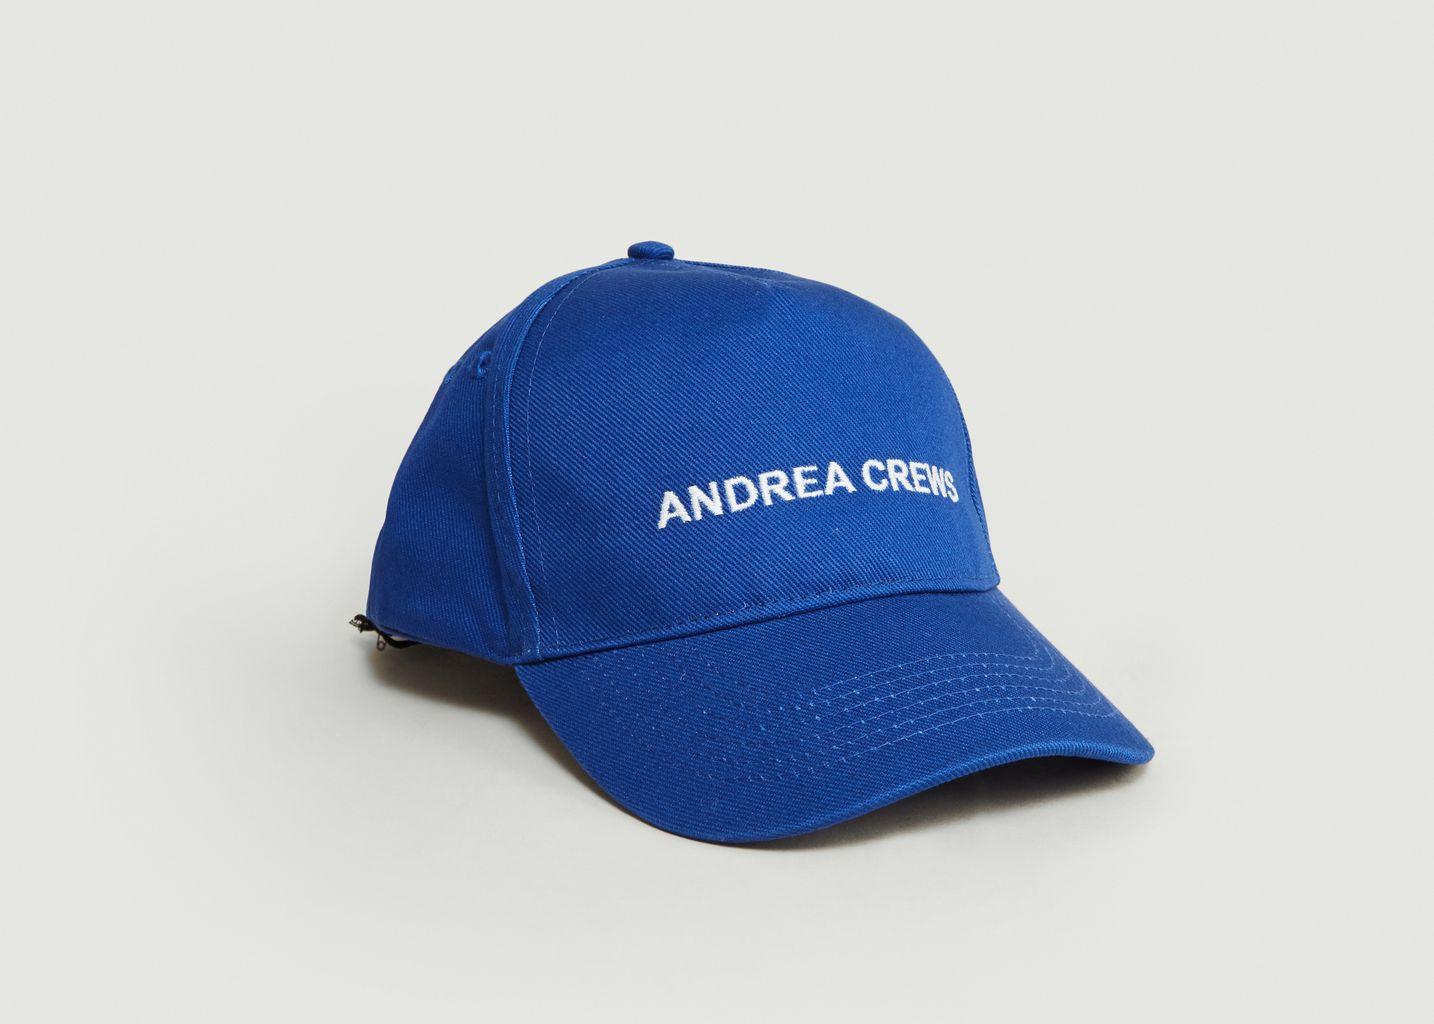 Signature Cap - Andrea Crews